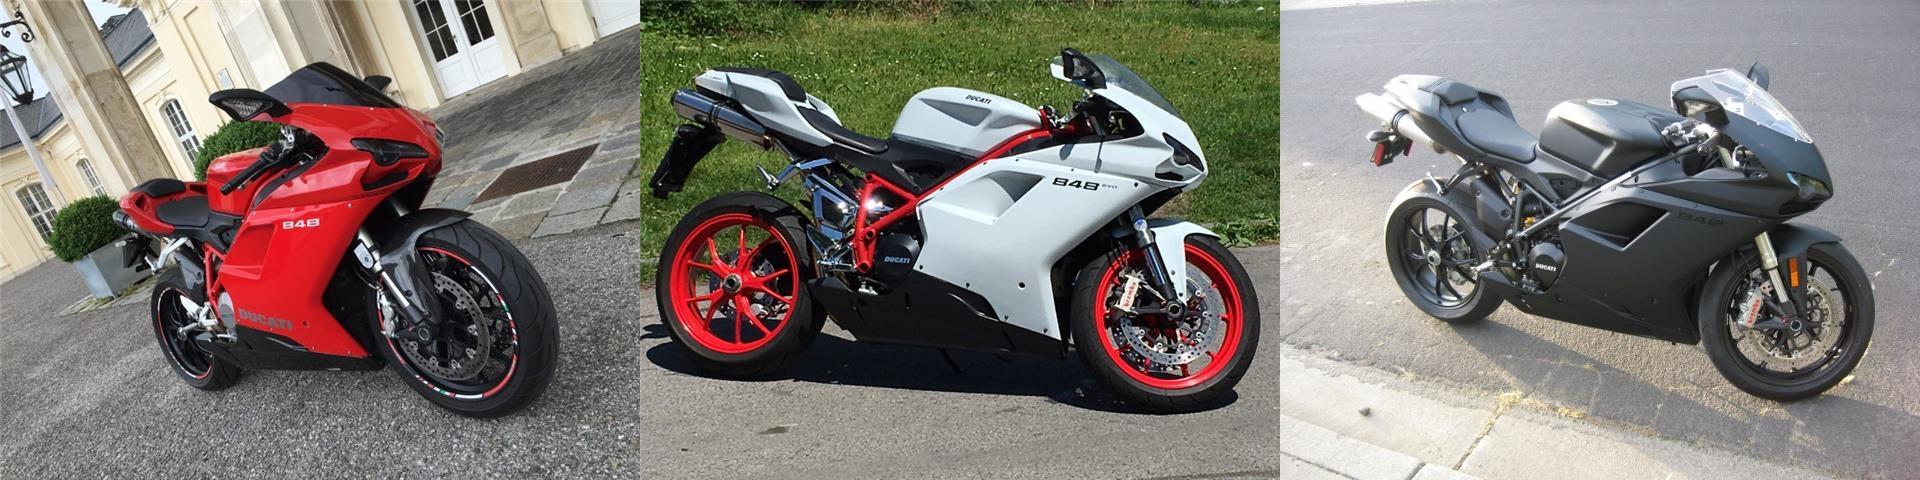 ducati 848 welche farbe motorrad supersport. Black Bedroom Furniture Sets. Home Design Ideas